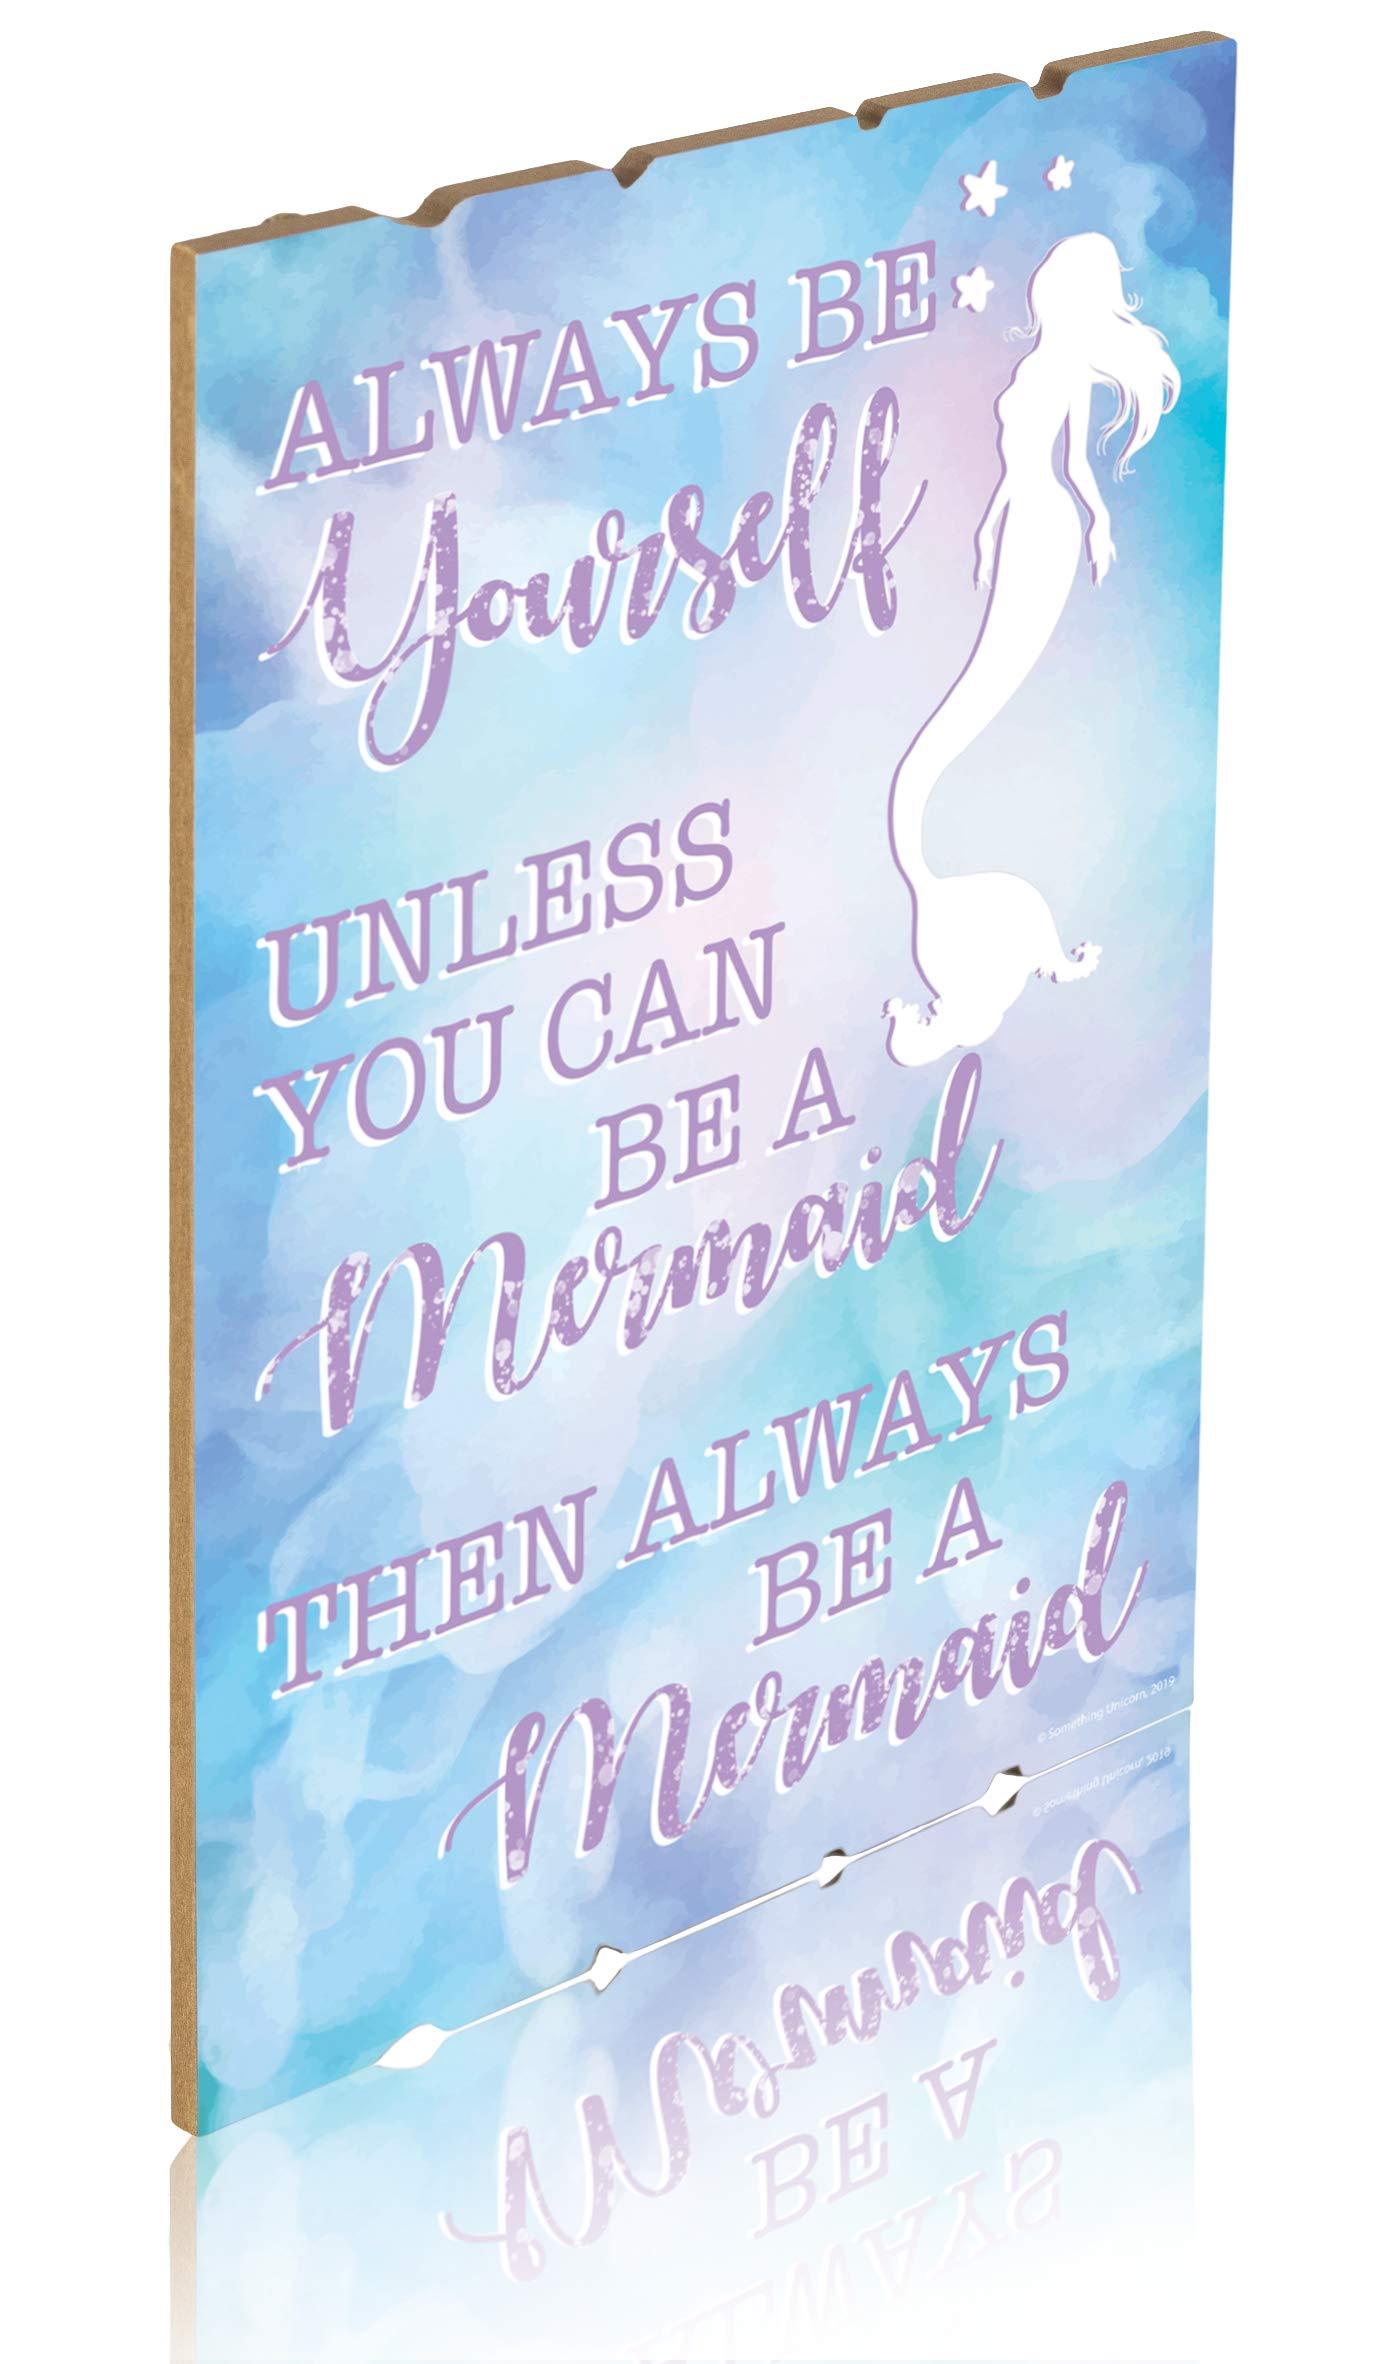 Something Unicorn - Wall Hanging Mermaid Sign for Teen Girls, Kid's Bedroom, Nursery, College Dorm, Girls Room Decor. Amazing Gift for Mermaid Lovers,12x17 in, Mermaid Version